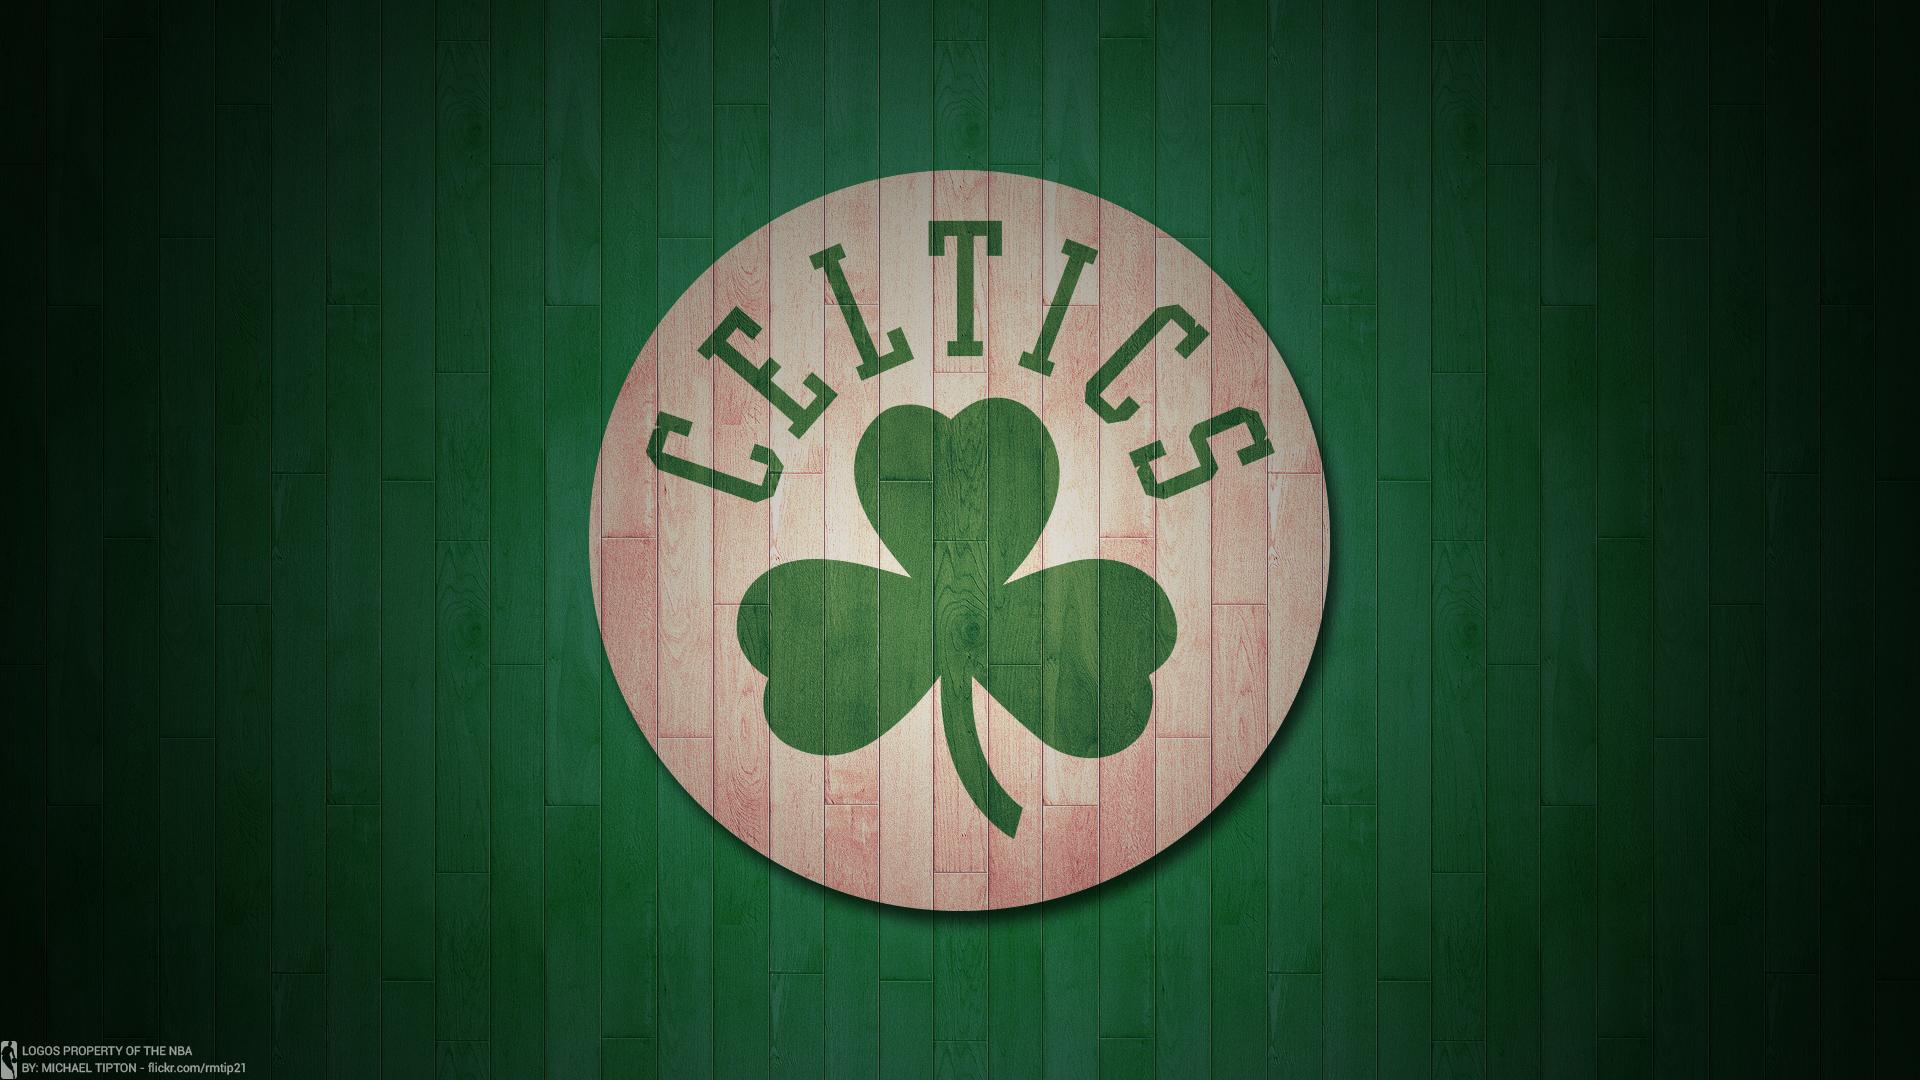 High Resolution Wallpaper | Boston Celtics 1920x1080 px